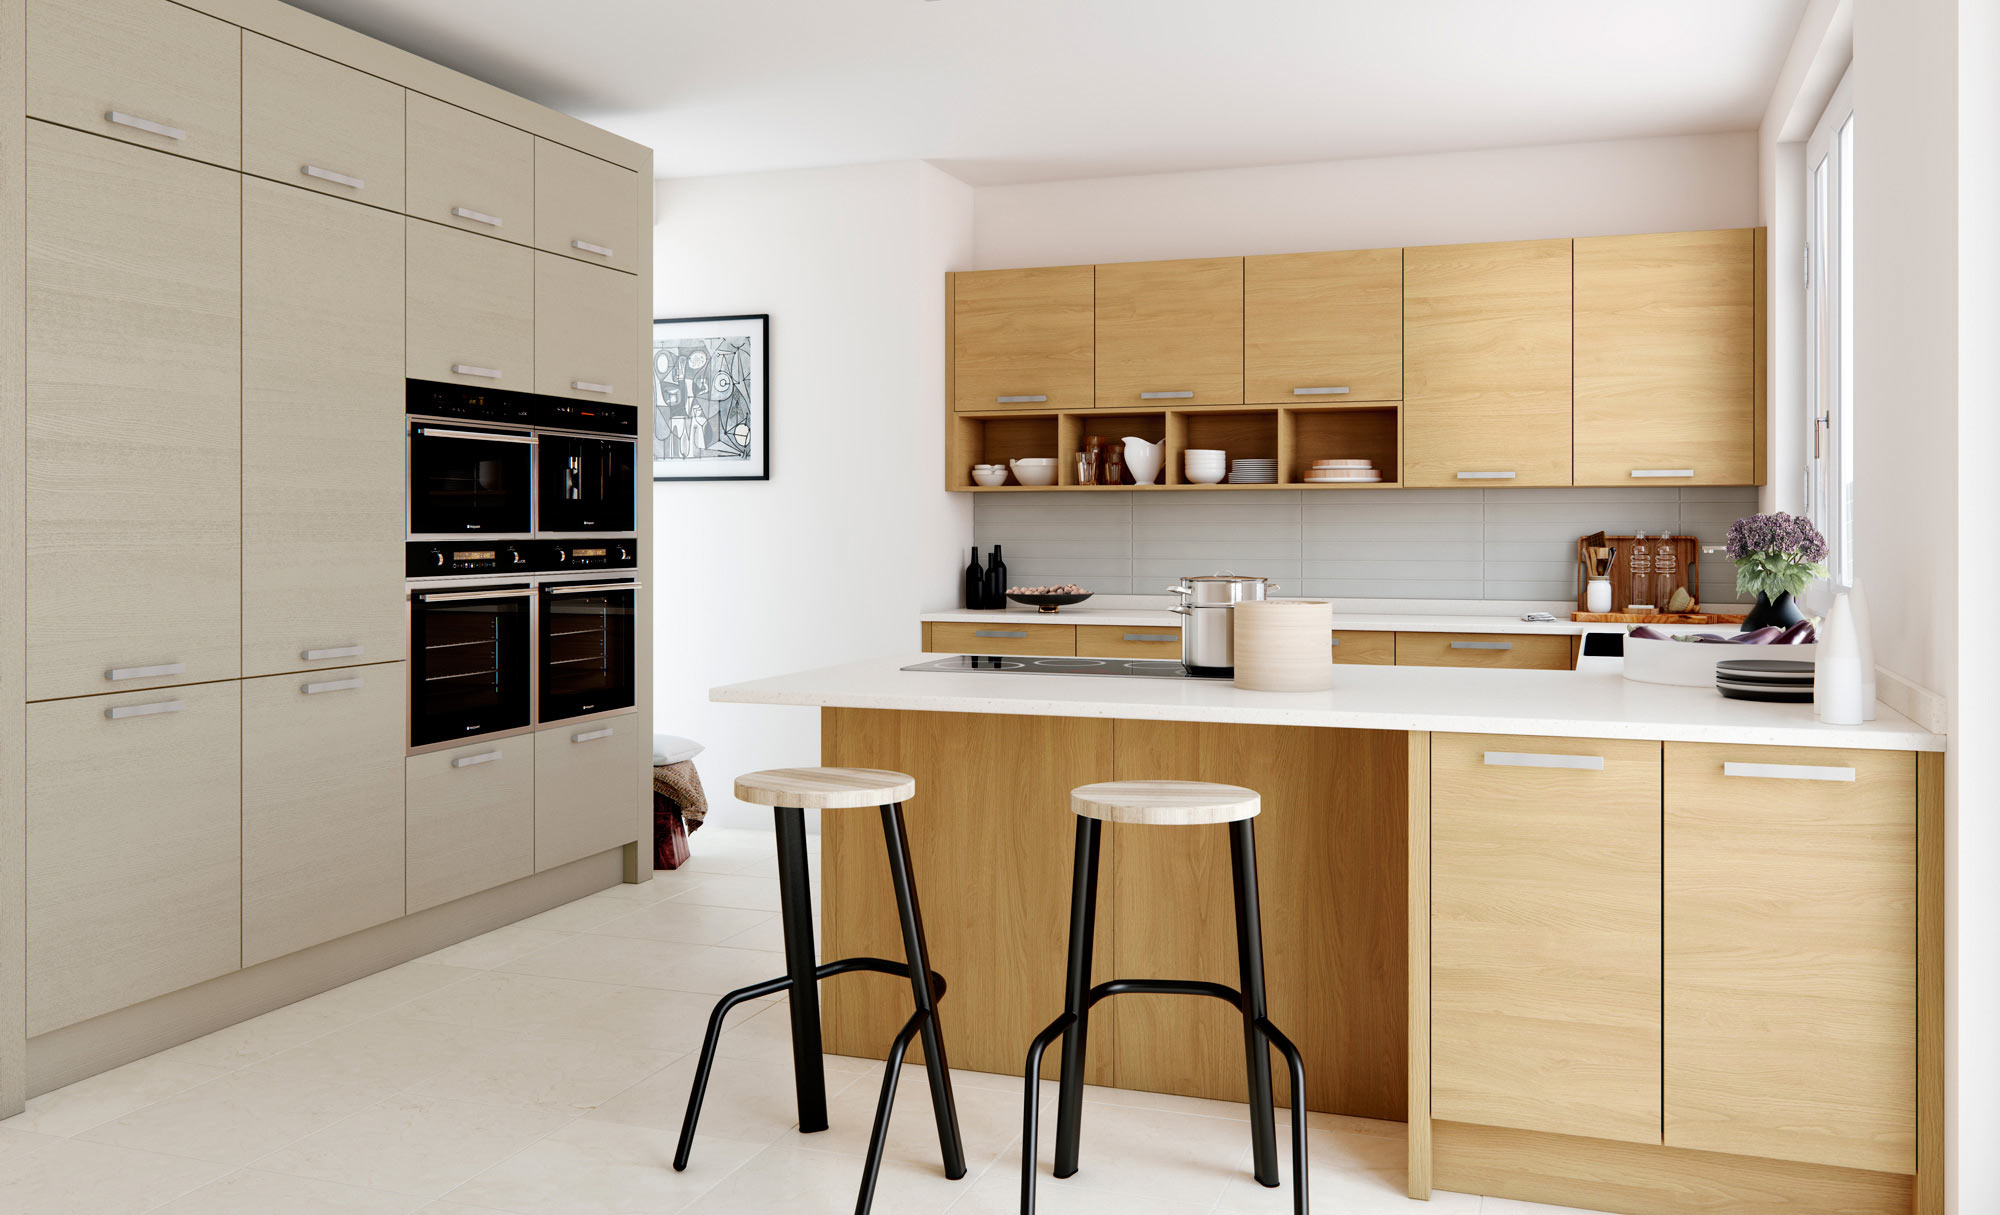 Uform Tavola Light Oak & Cashmere Kitchen